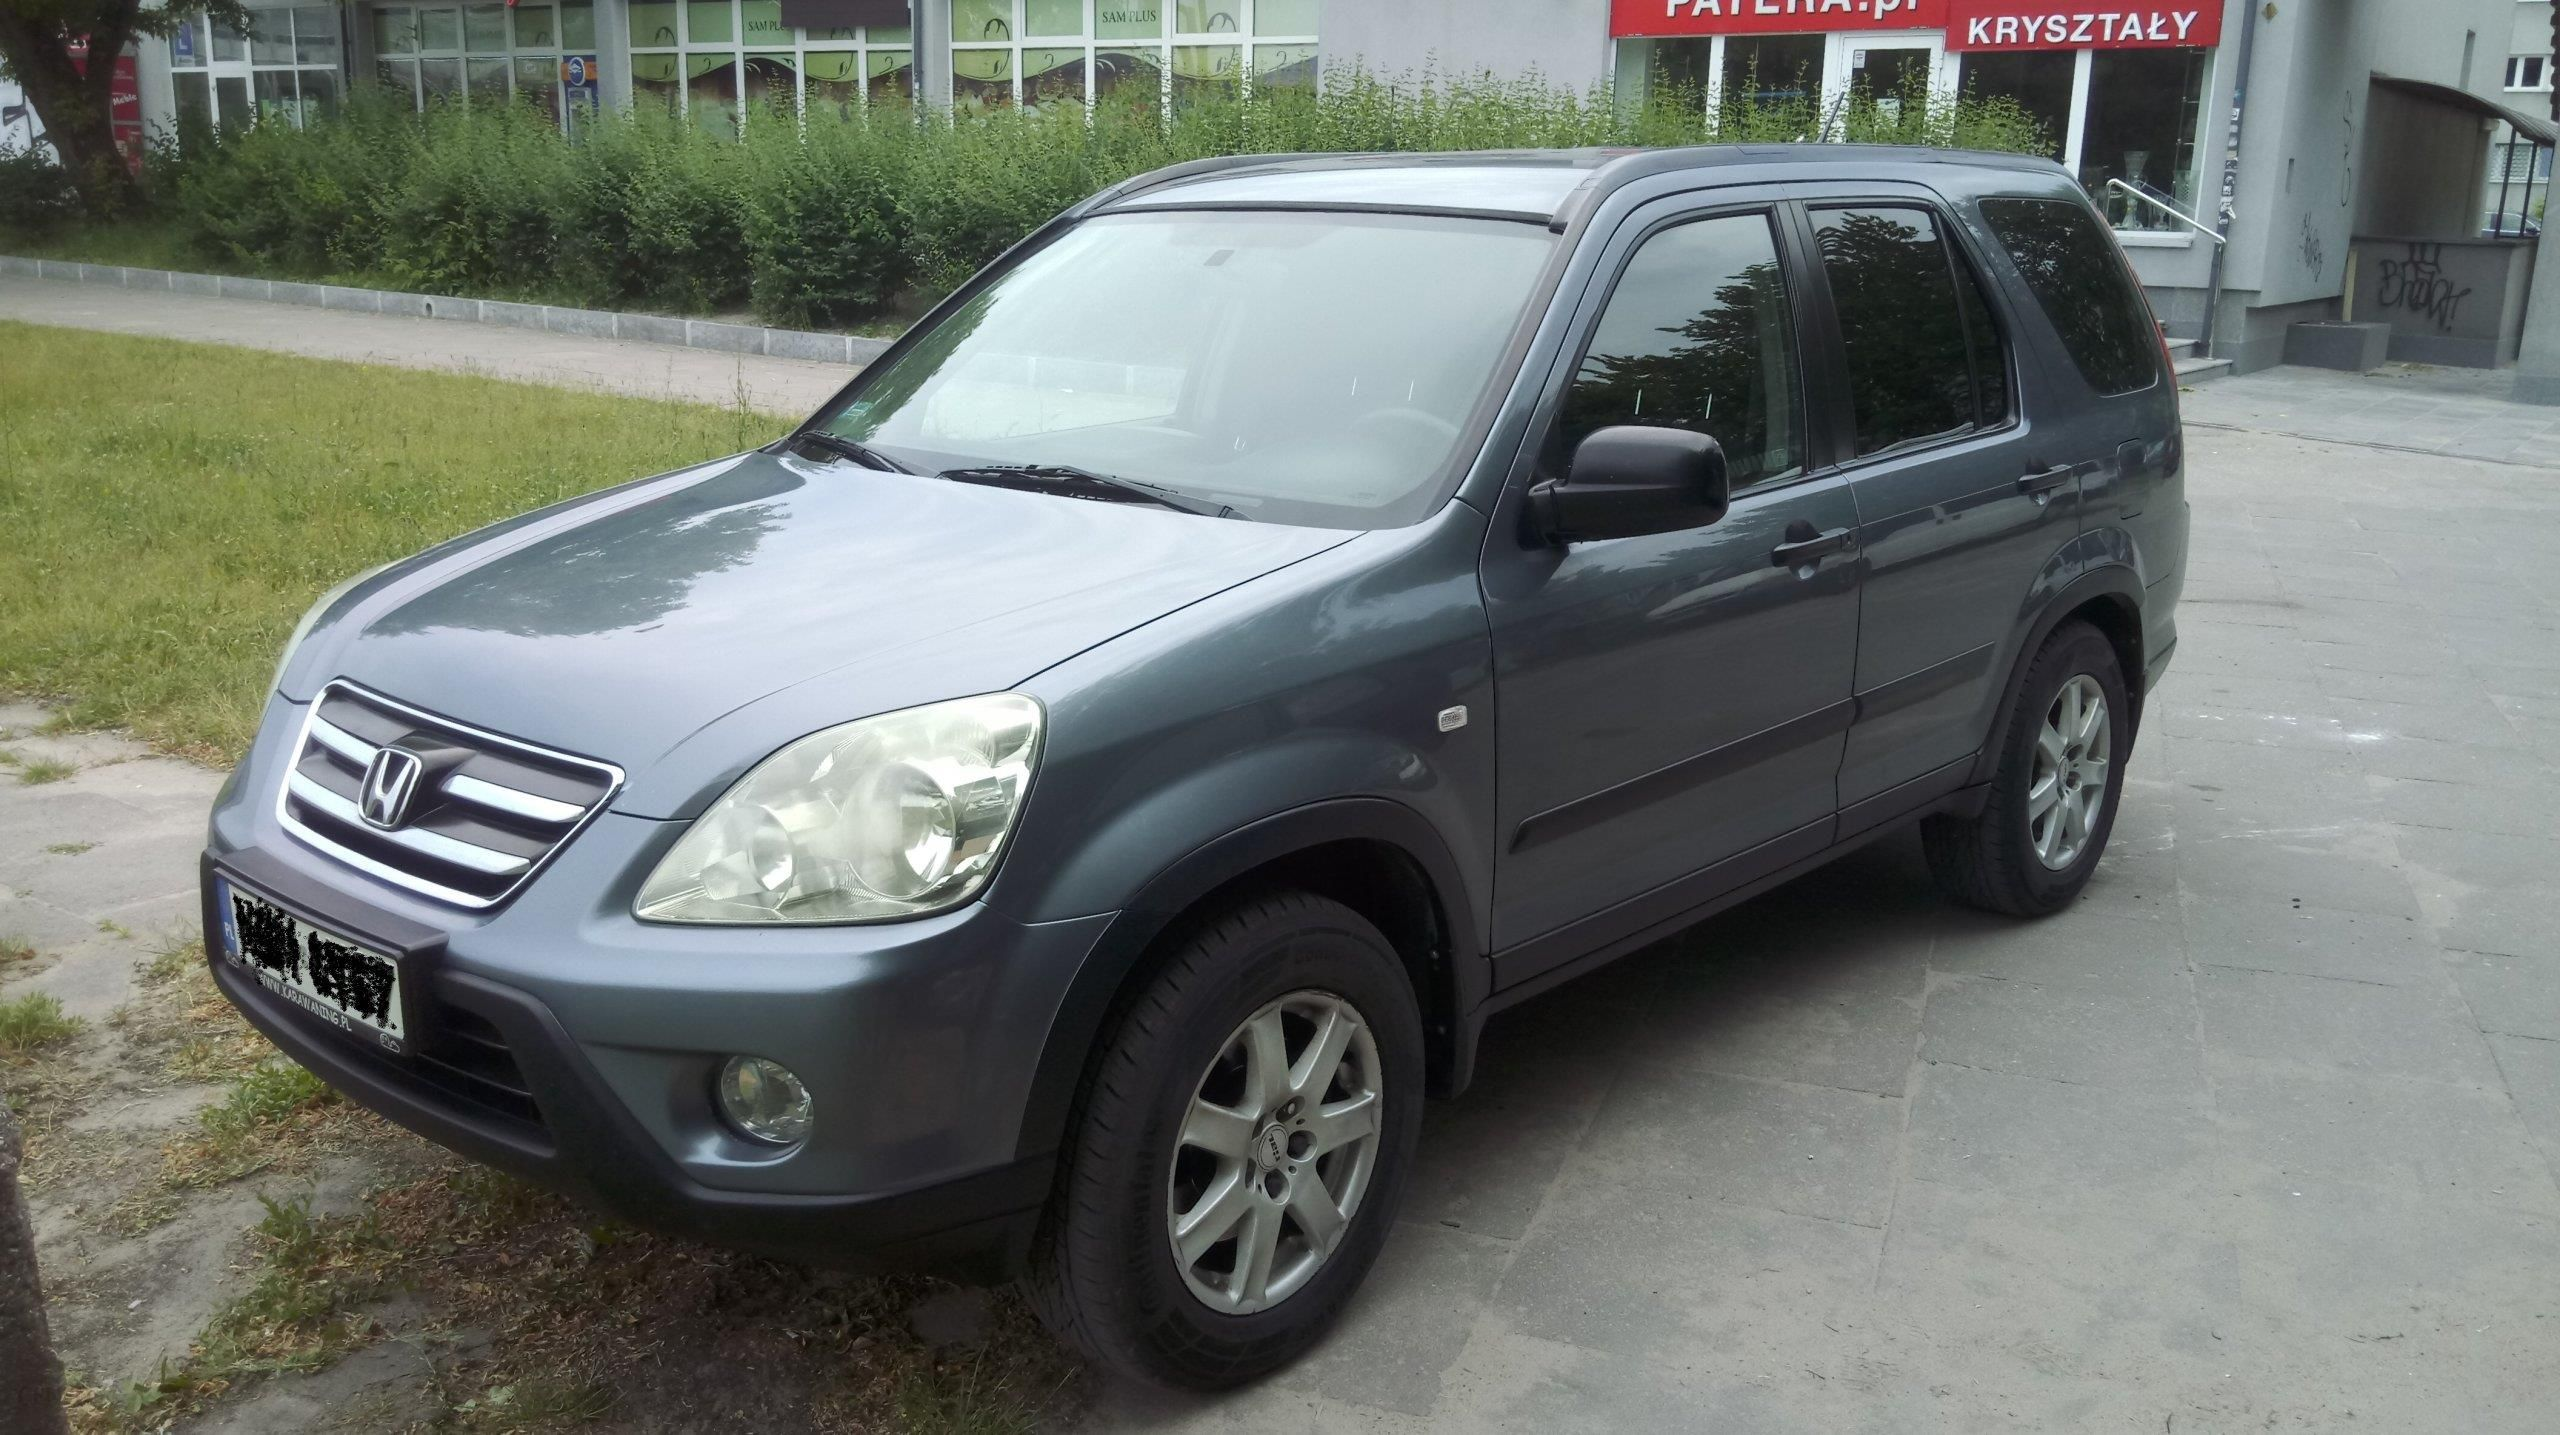 Honda Cr V Ii 2005 Diesel 140km Suv Szary Opinie I Ceny Na Ceneopl